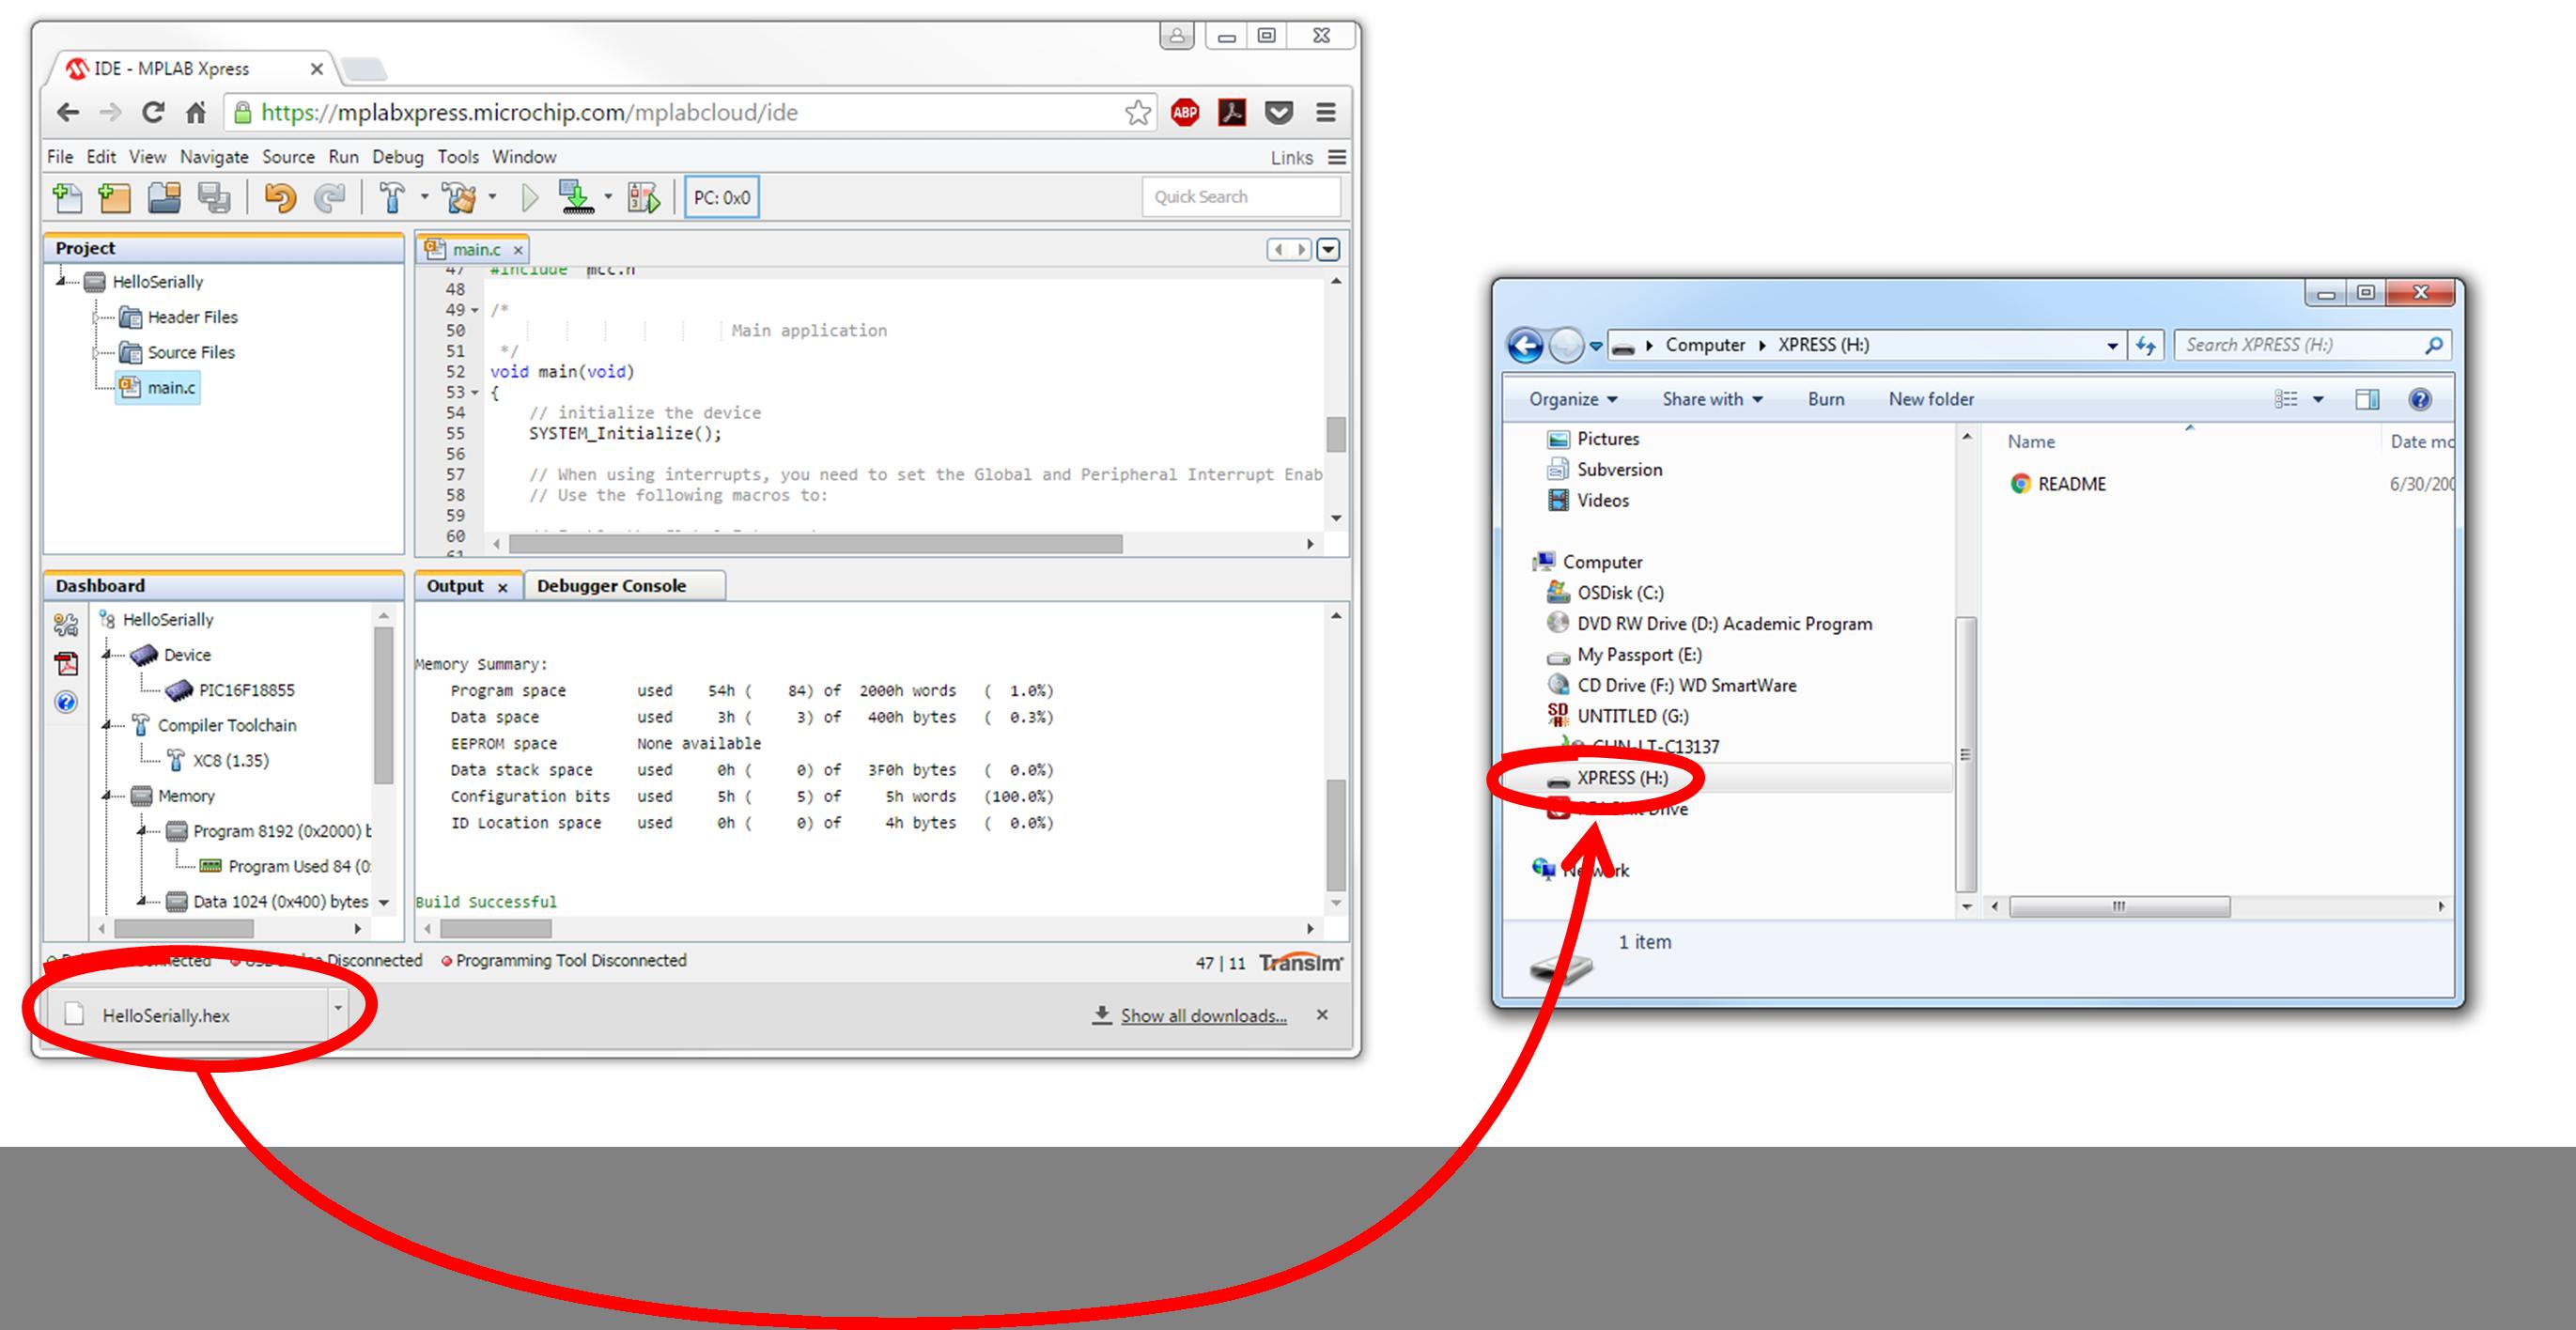 Code Free Switch Debounce using TMR2 with HLT - Developer Help